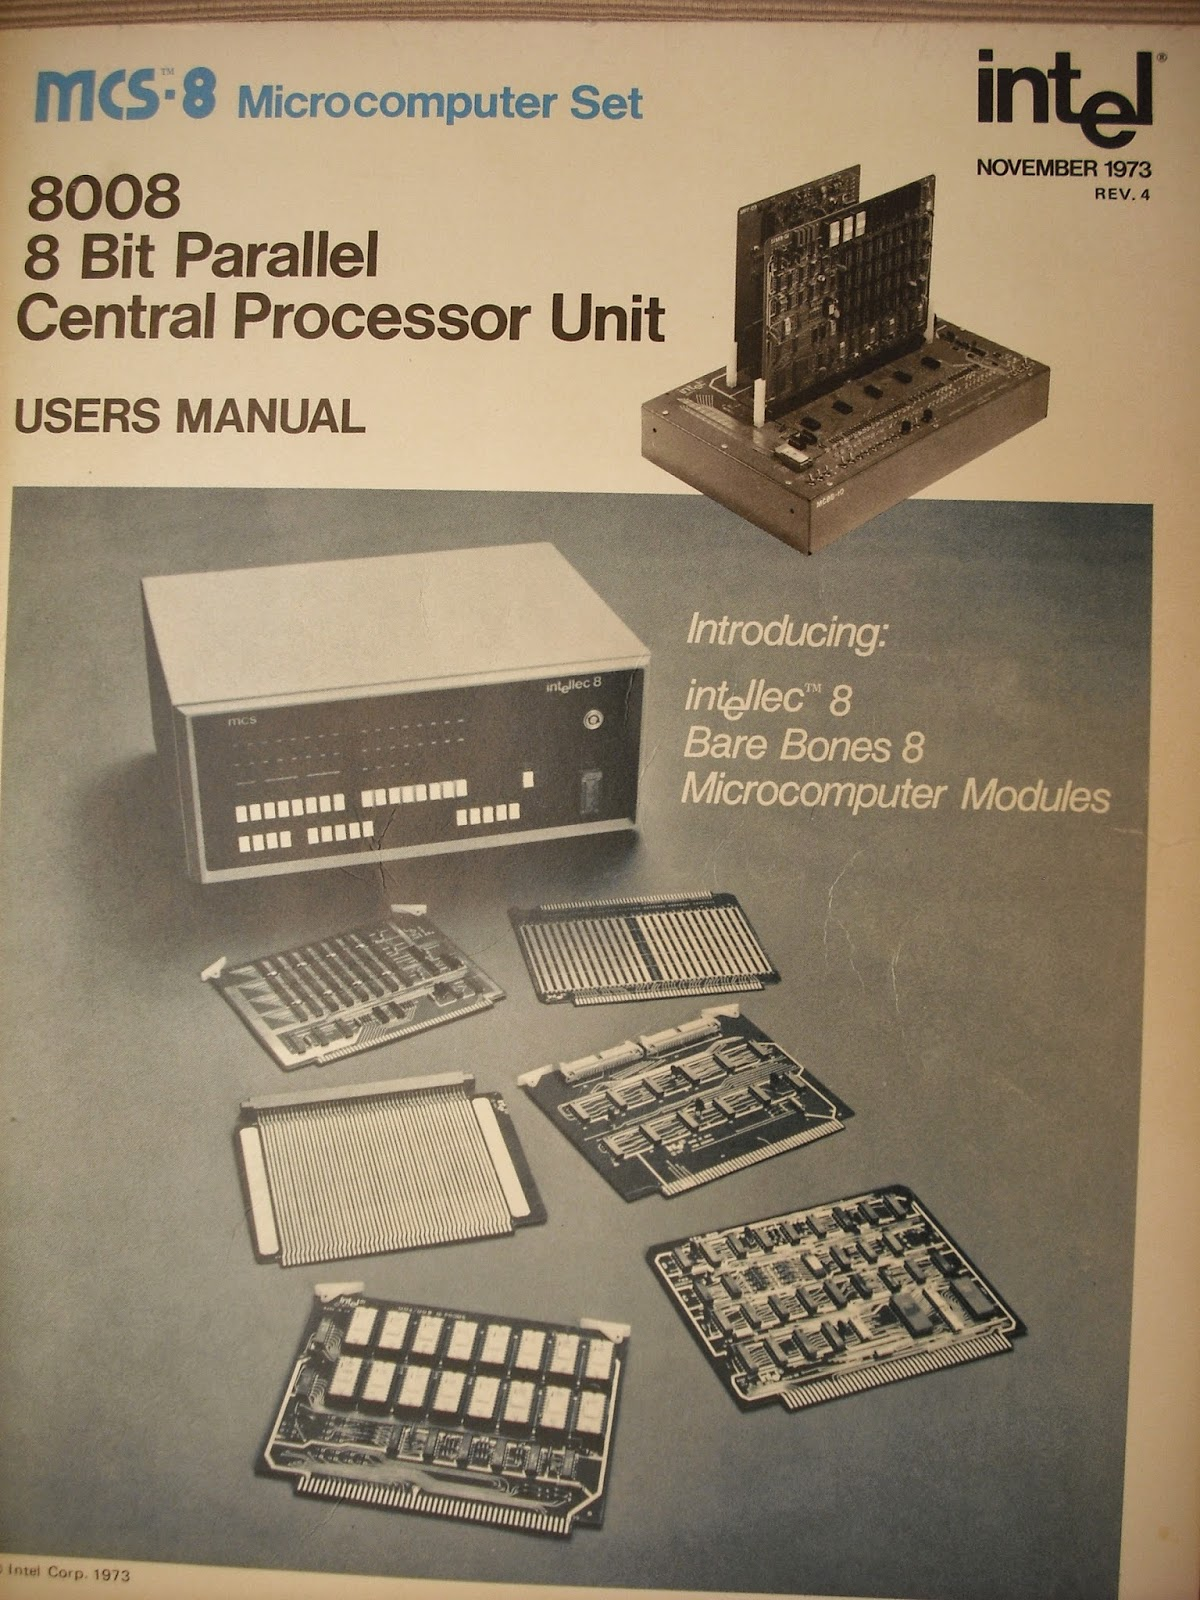 8008 manual